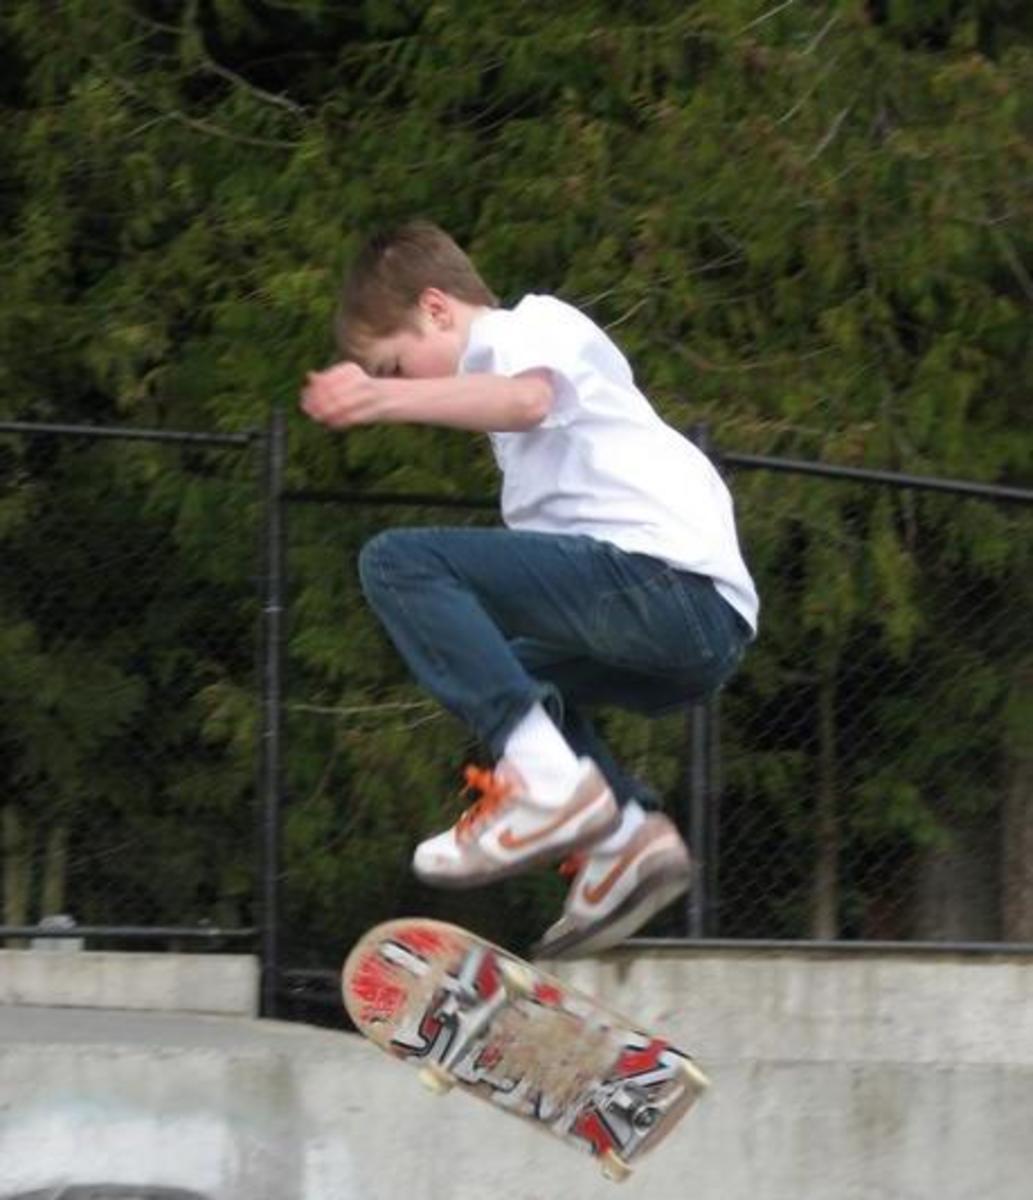 Skateboarding at the skate park located at Volunteer Park.